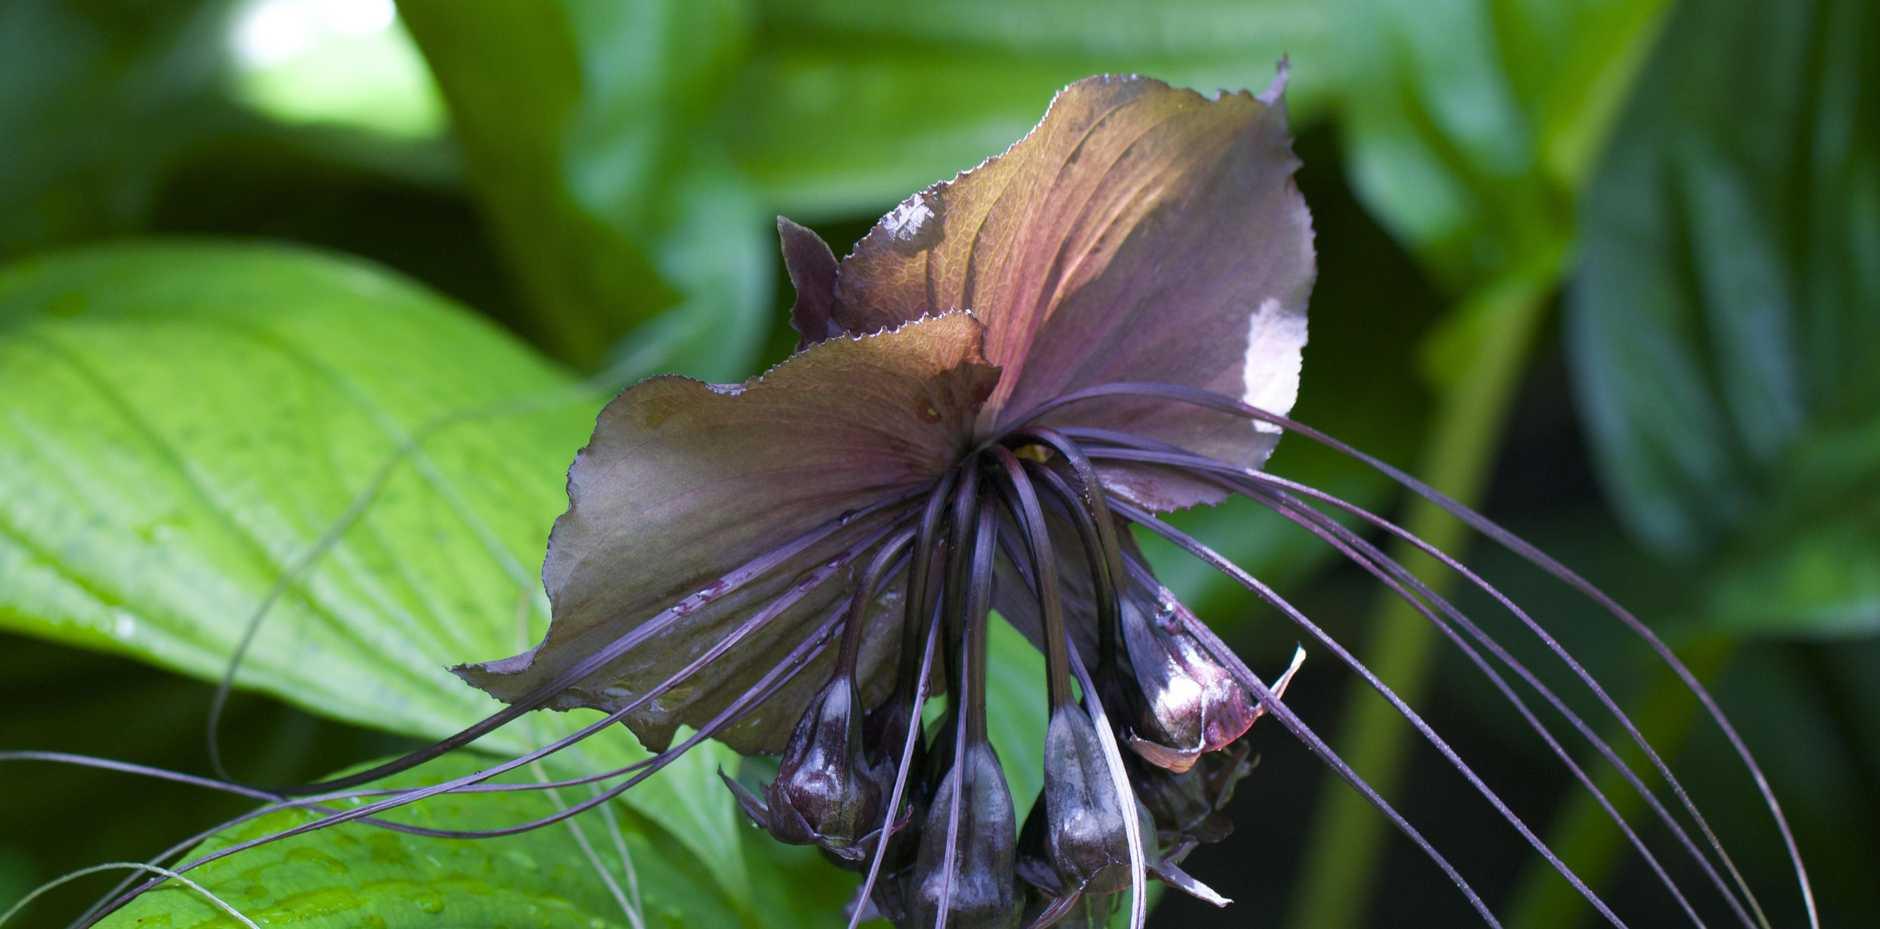 The black bat plant.